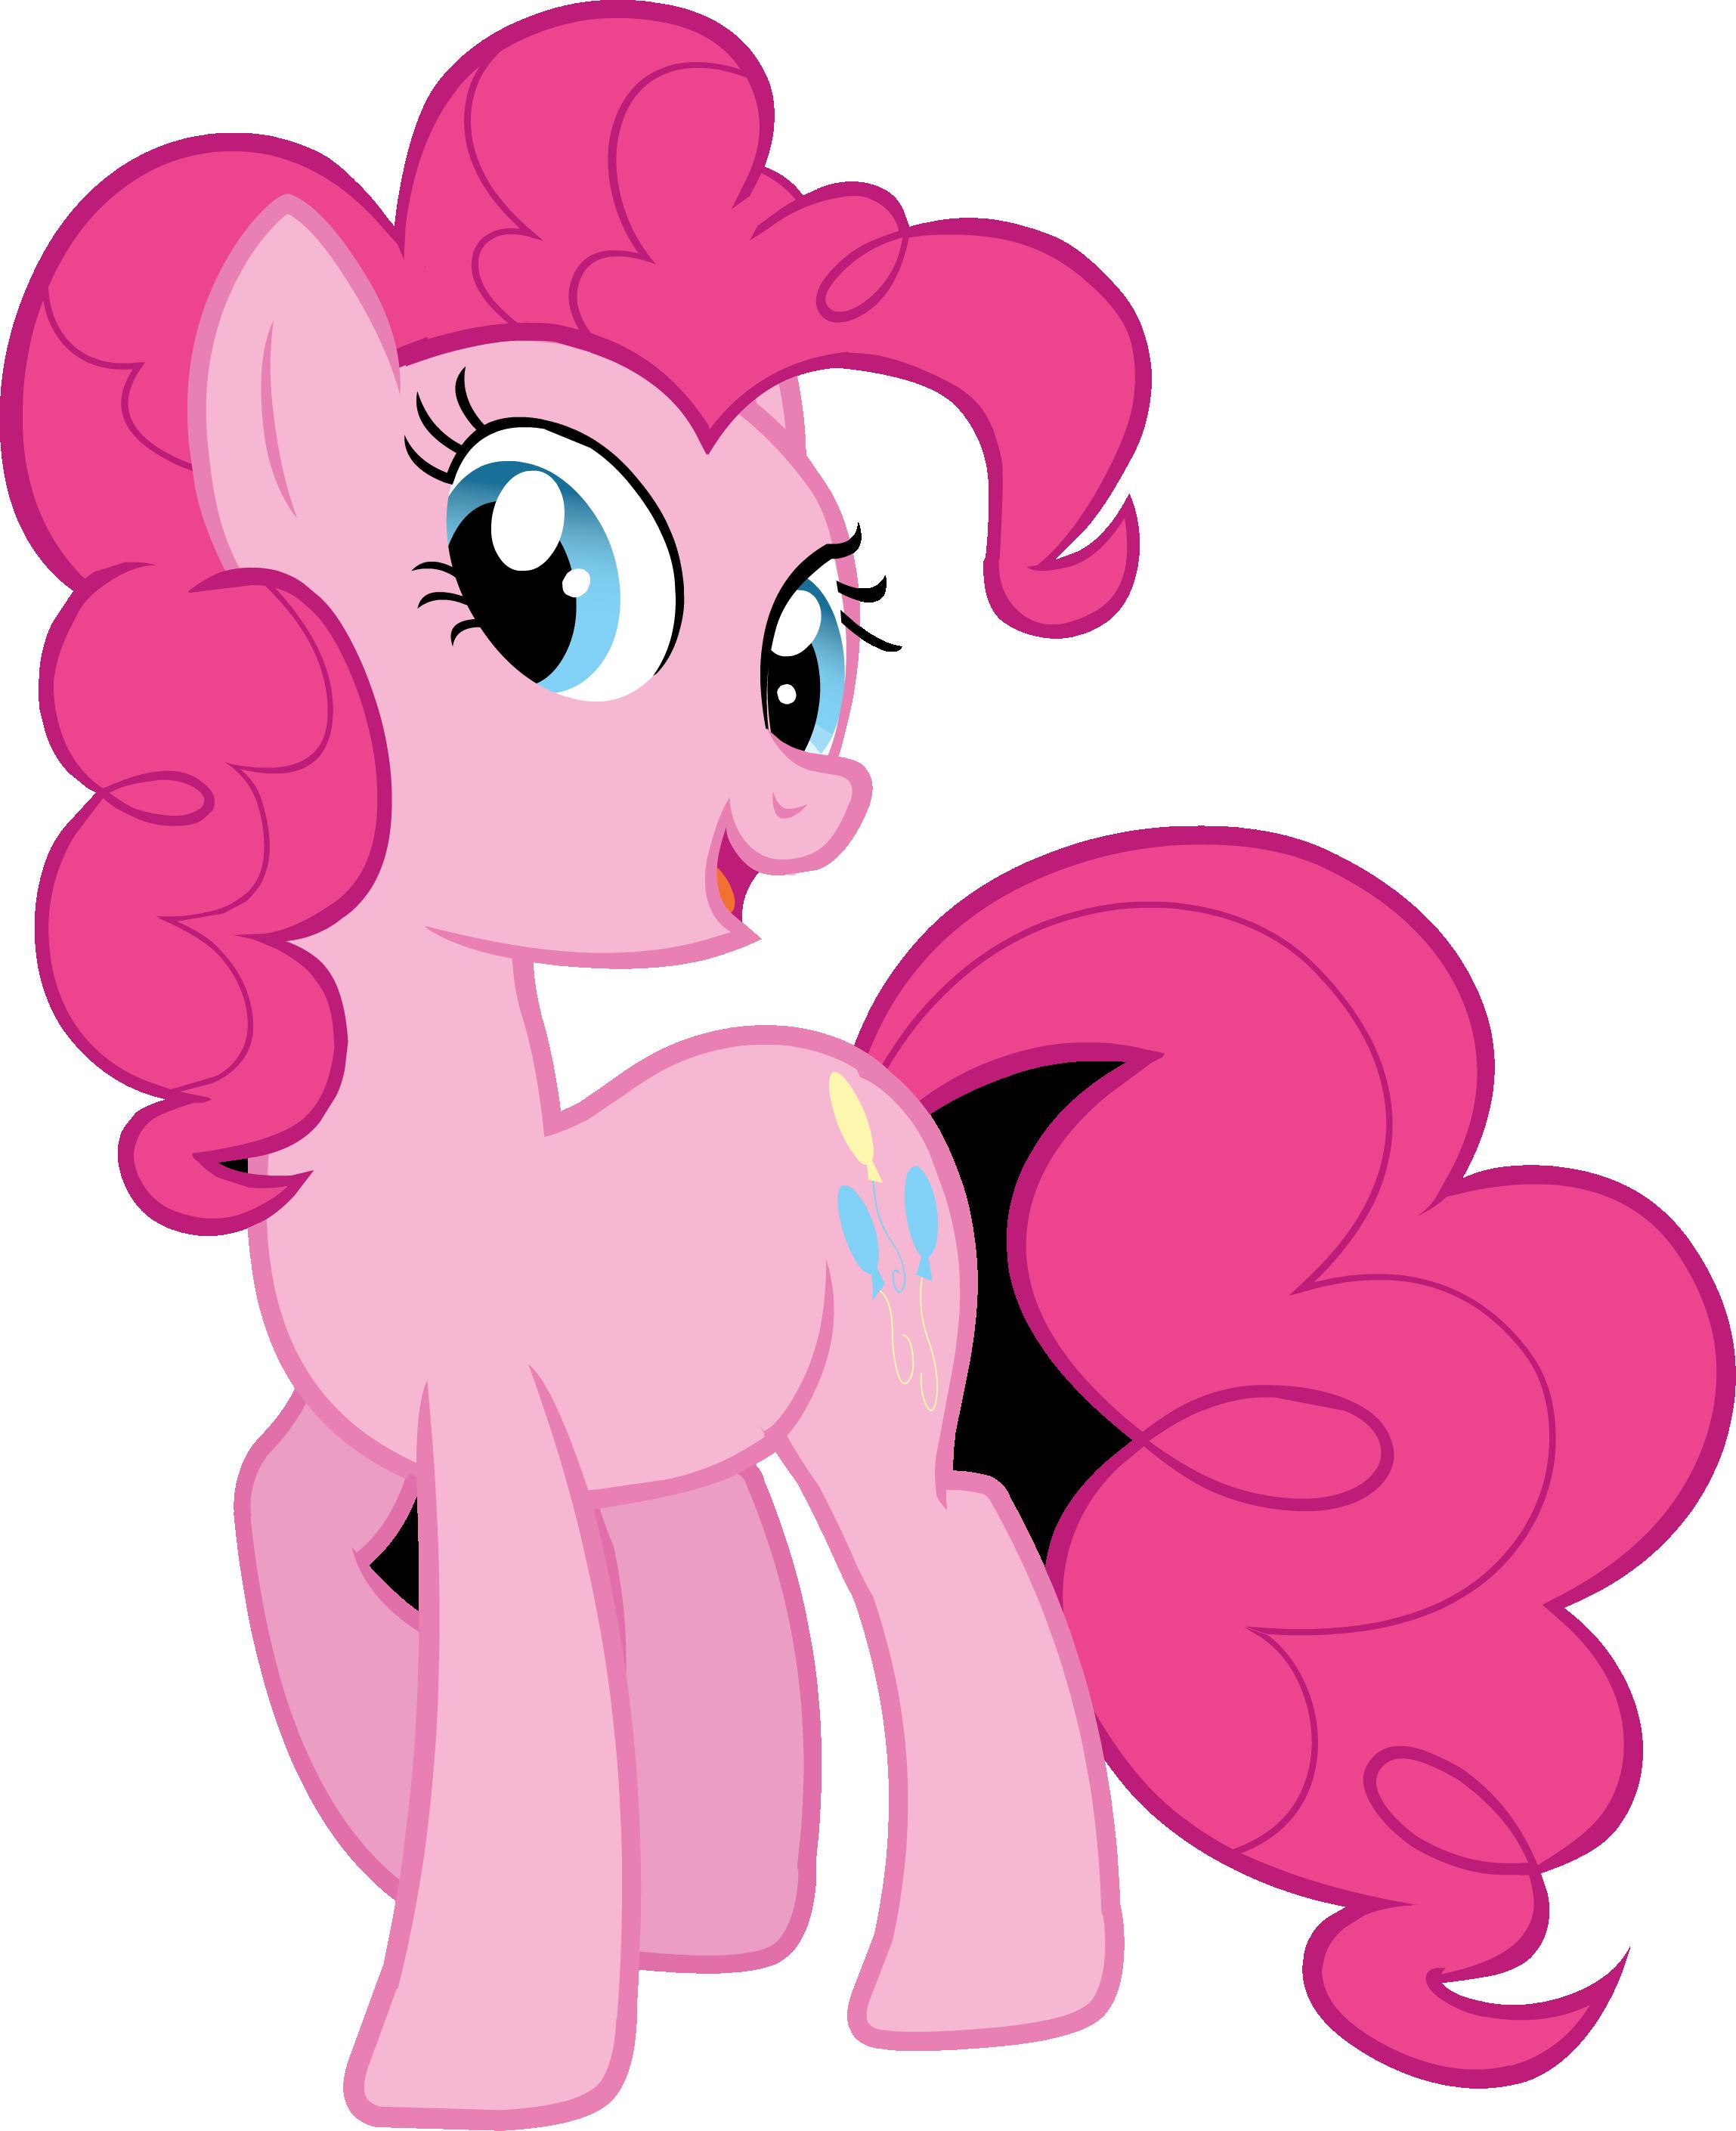 my little pony clipart pinkie pie - Clipground